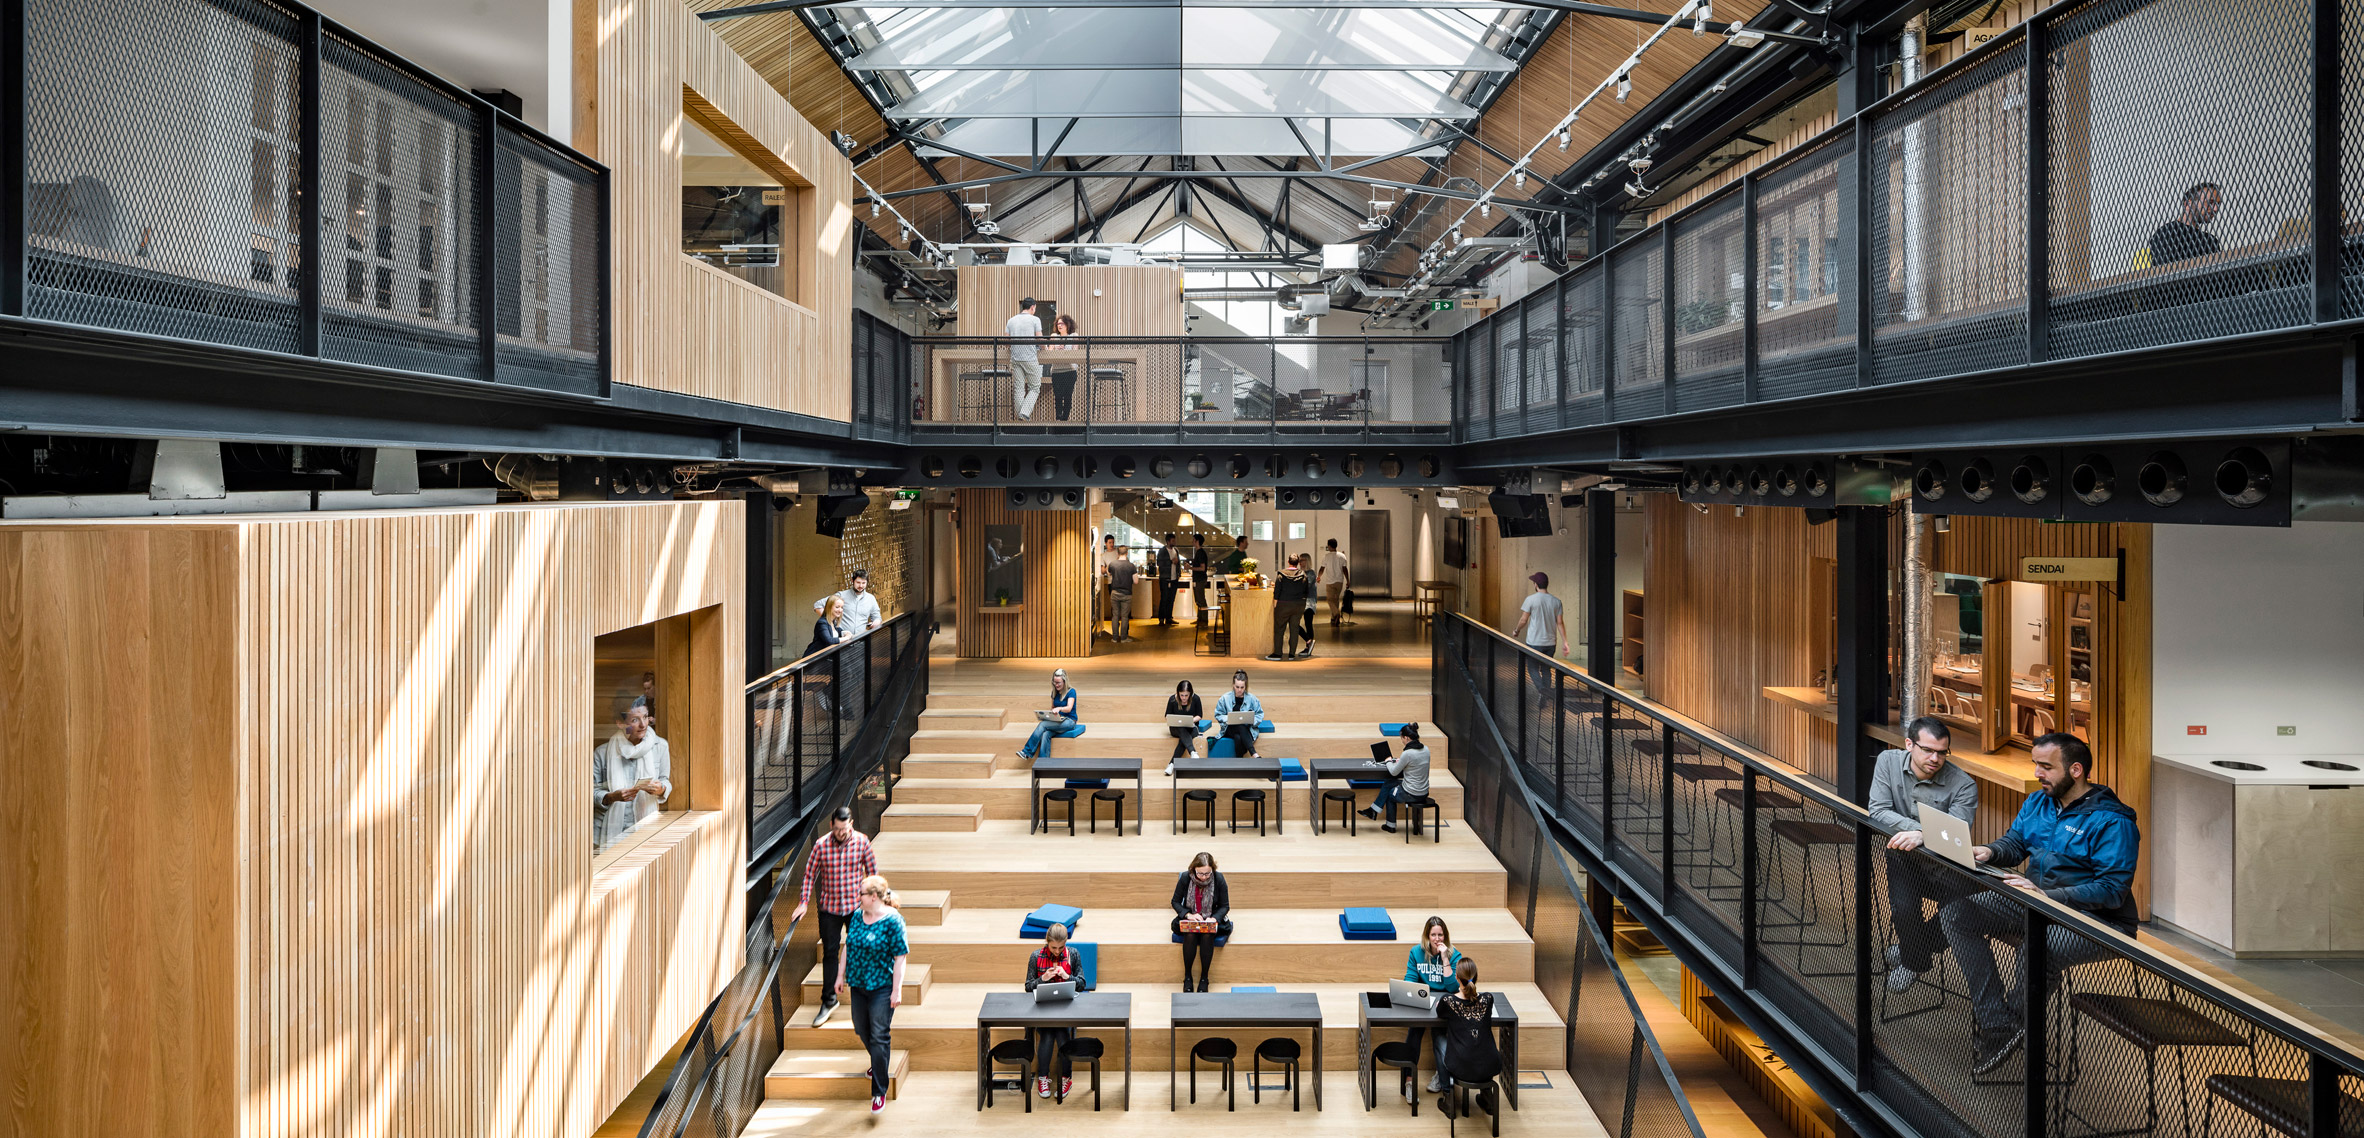 airbnb-dublin-office-interiors-ireland-offices_dezeen_2364_col_11